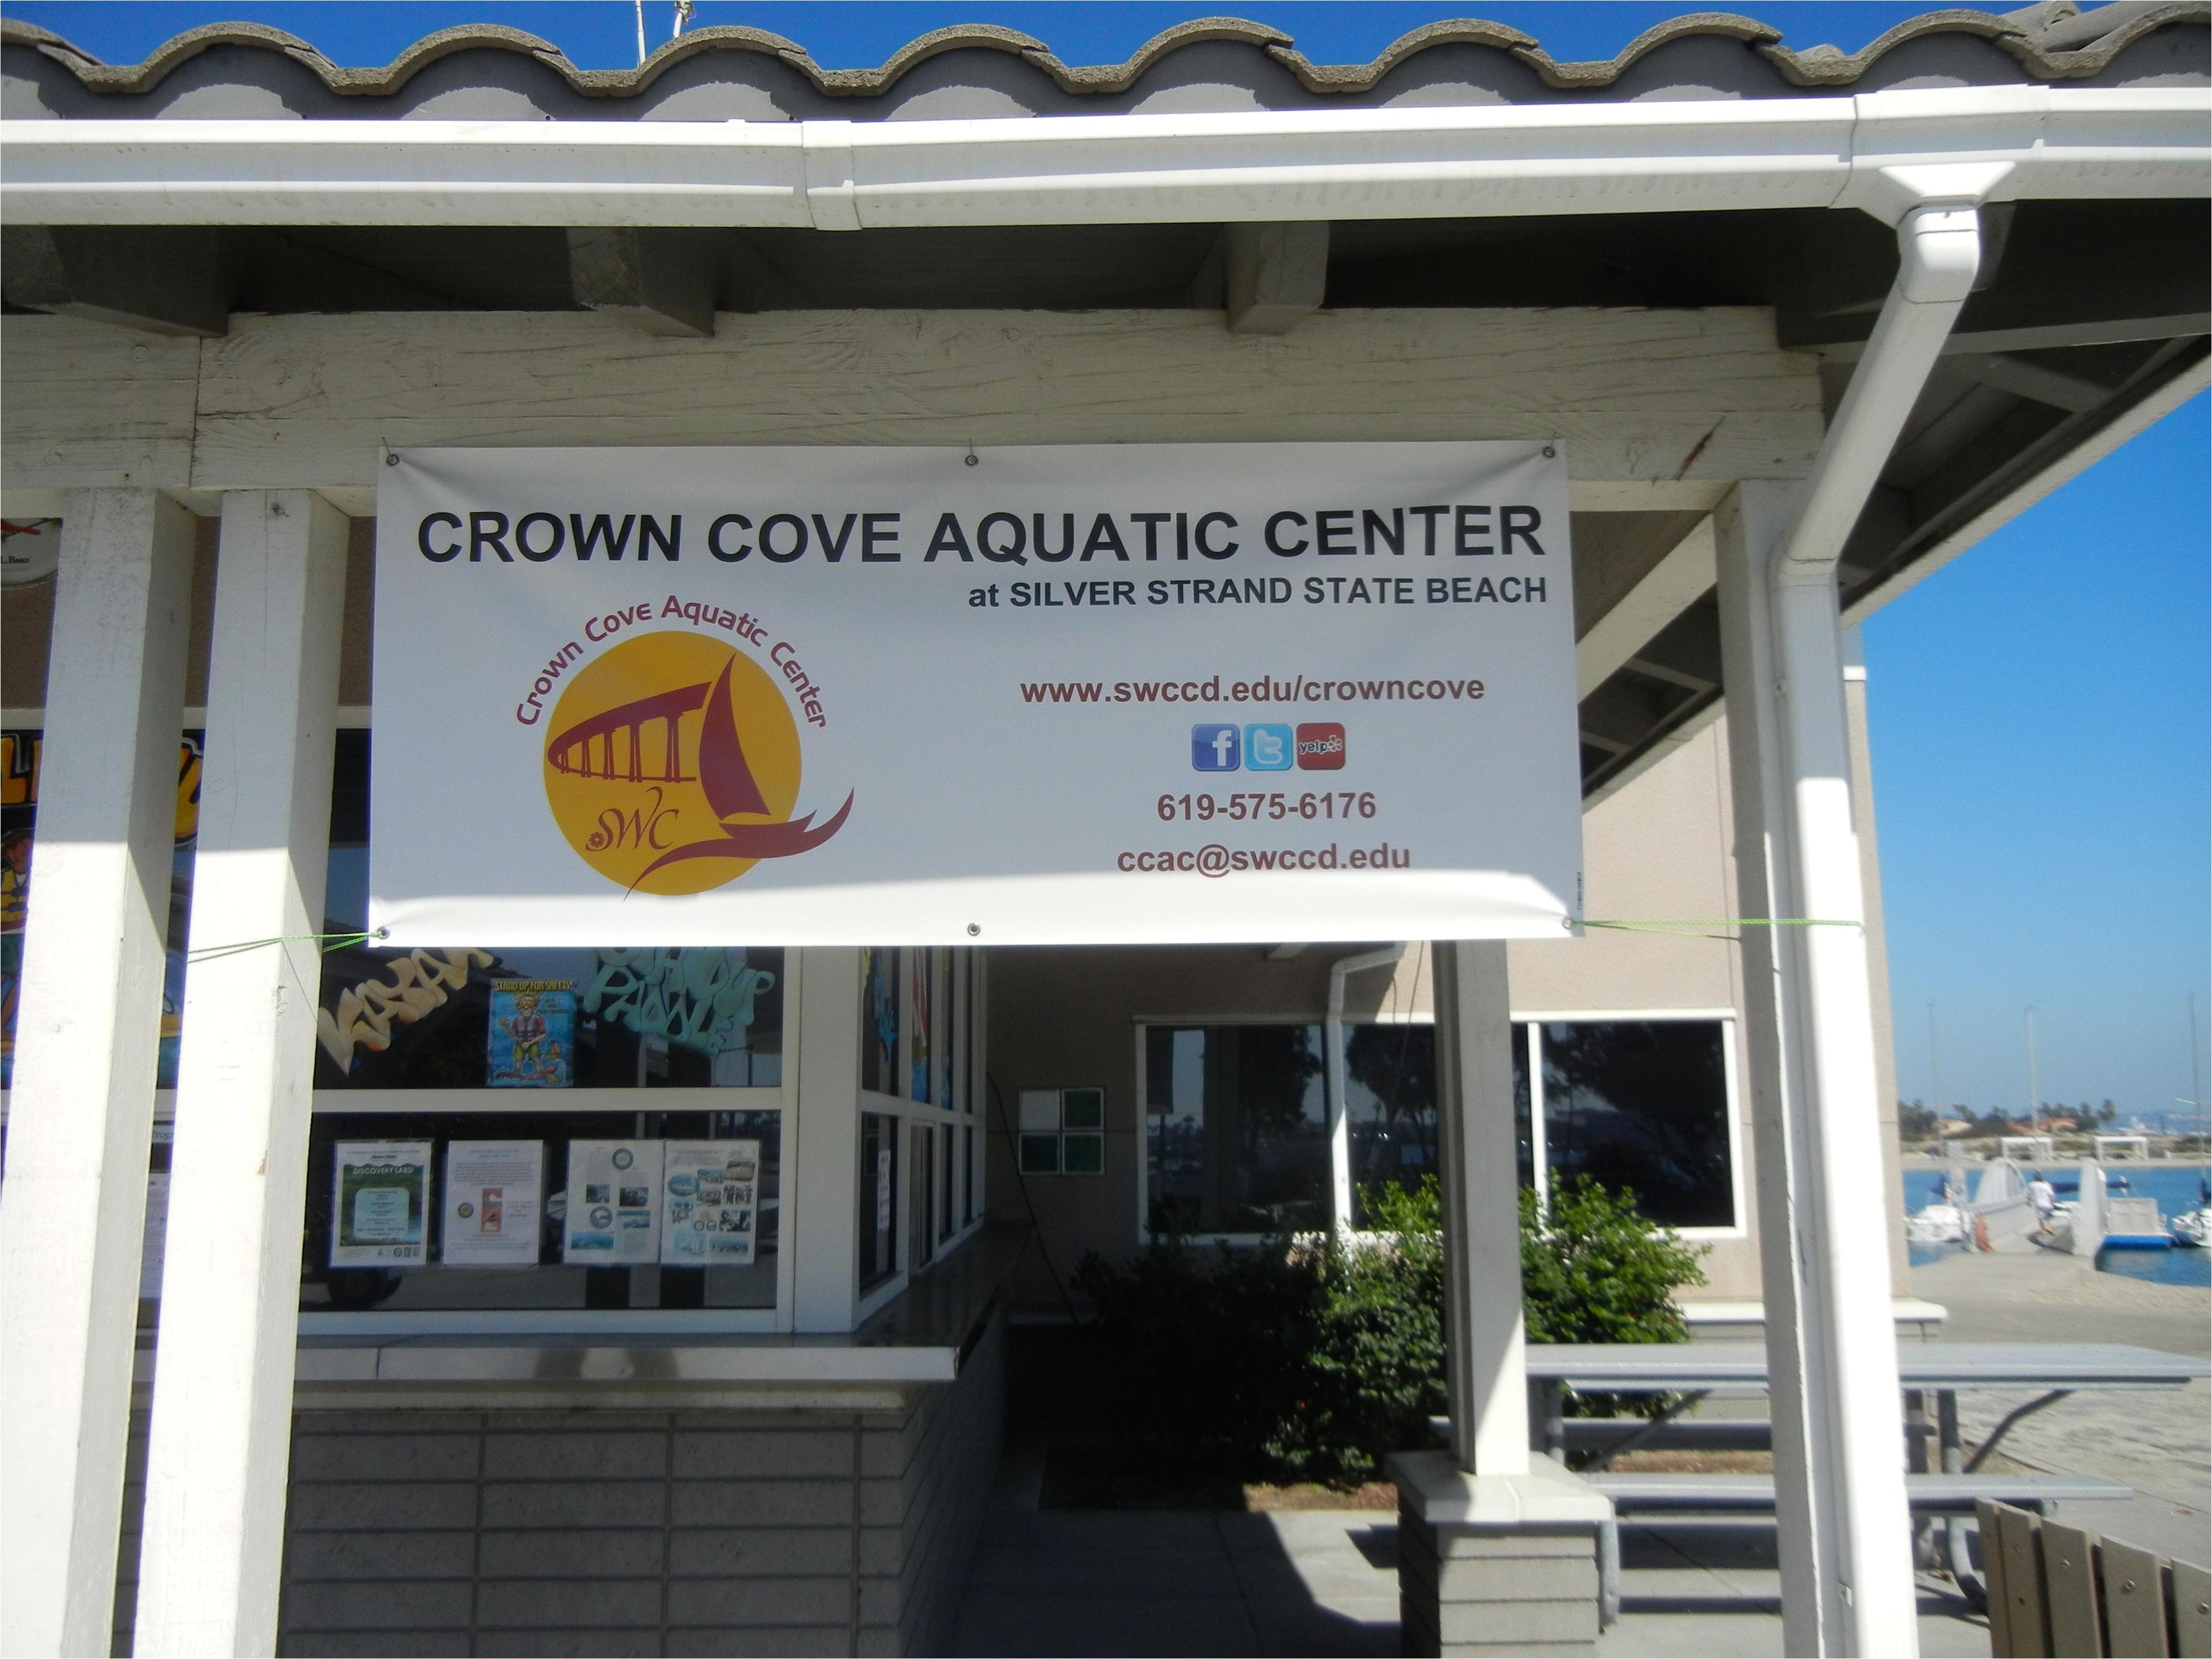 crown cove aquatic center on south san diego bay has rental equipment